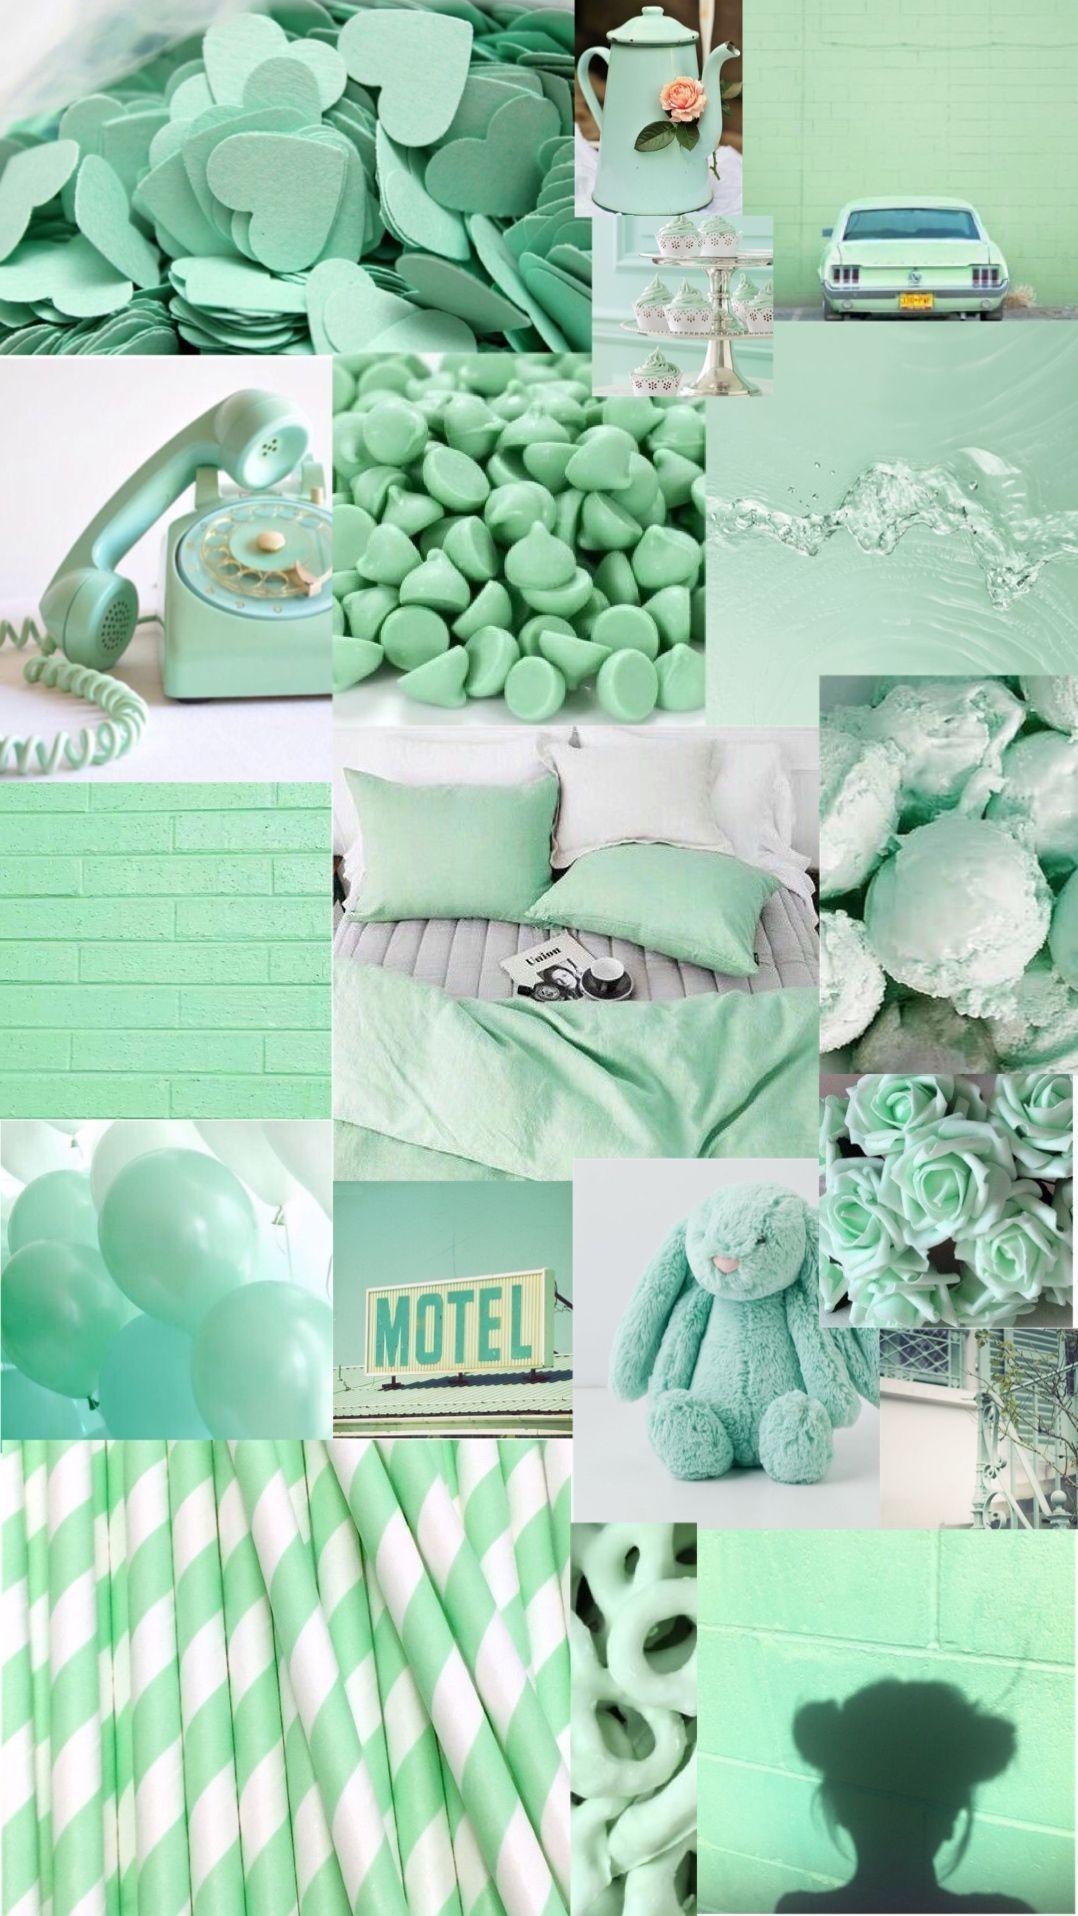 Light Green Aesthetic : light, green, aesthetic, Aesthetic, Light, Green, Wallpapers, Wallpaper